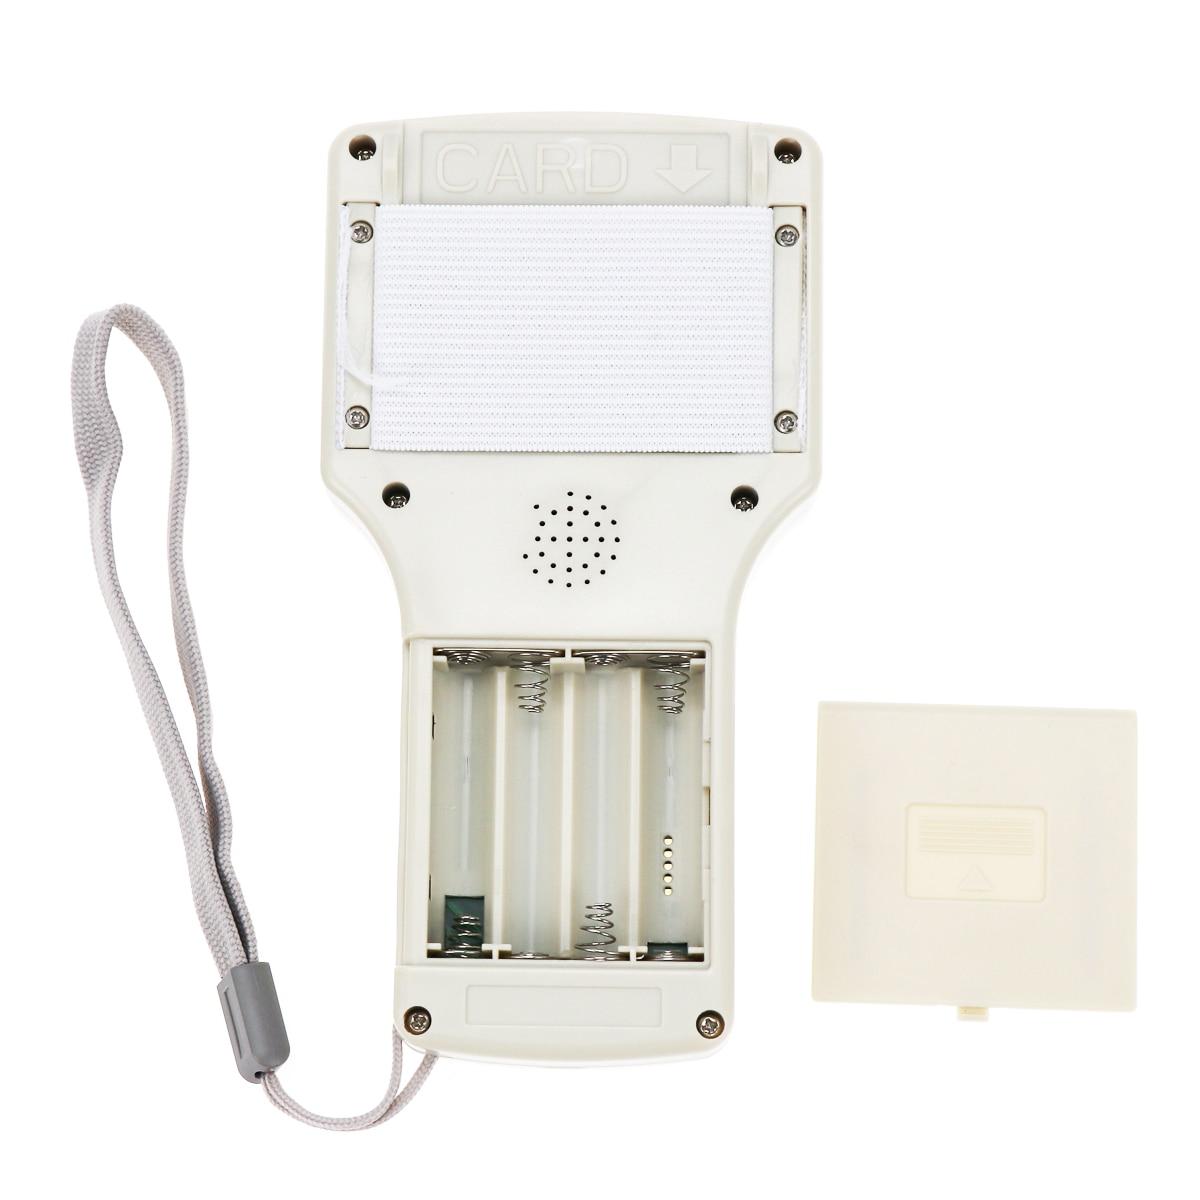 H146a553200b840c6b6d1581d71f1de63q English 10 frequency RFID Copier ID IC Reader Writer copy M1 13.56MHZ encrypted Duplicator Programmer USB NFC UID Tag Key Card